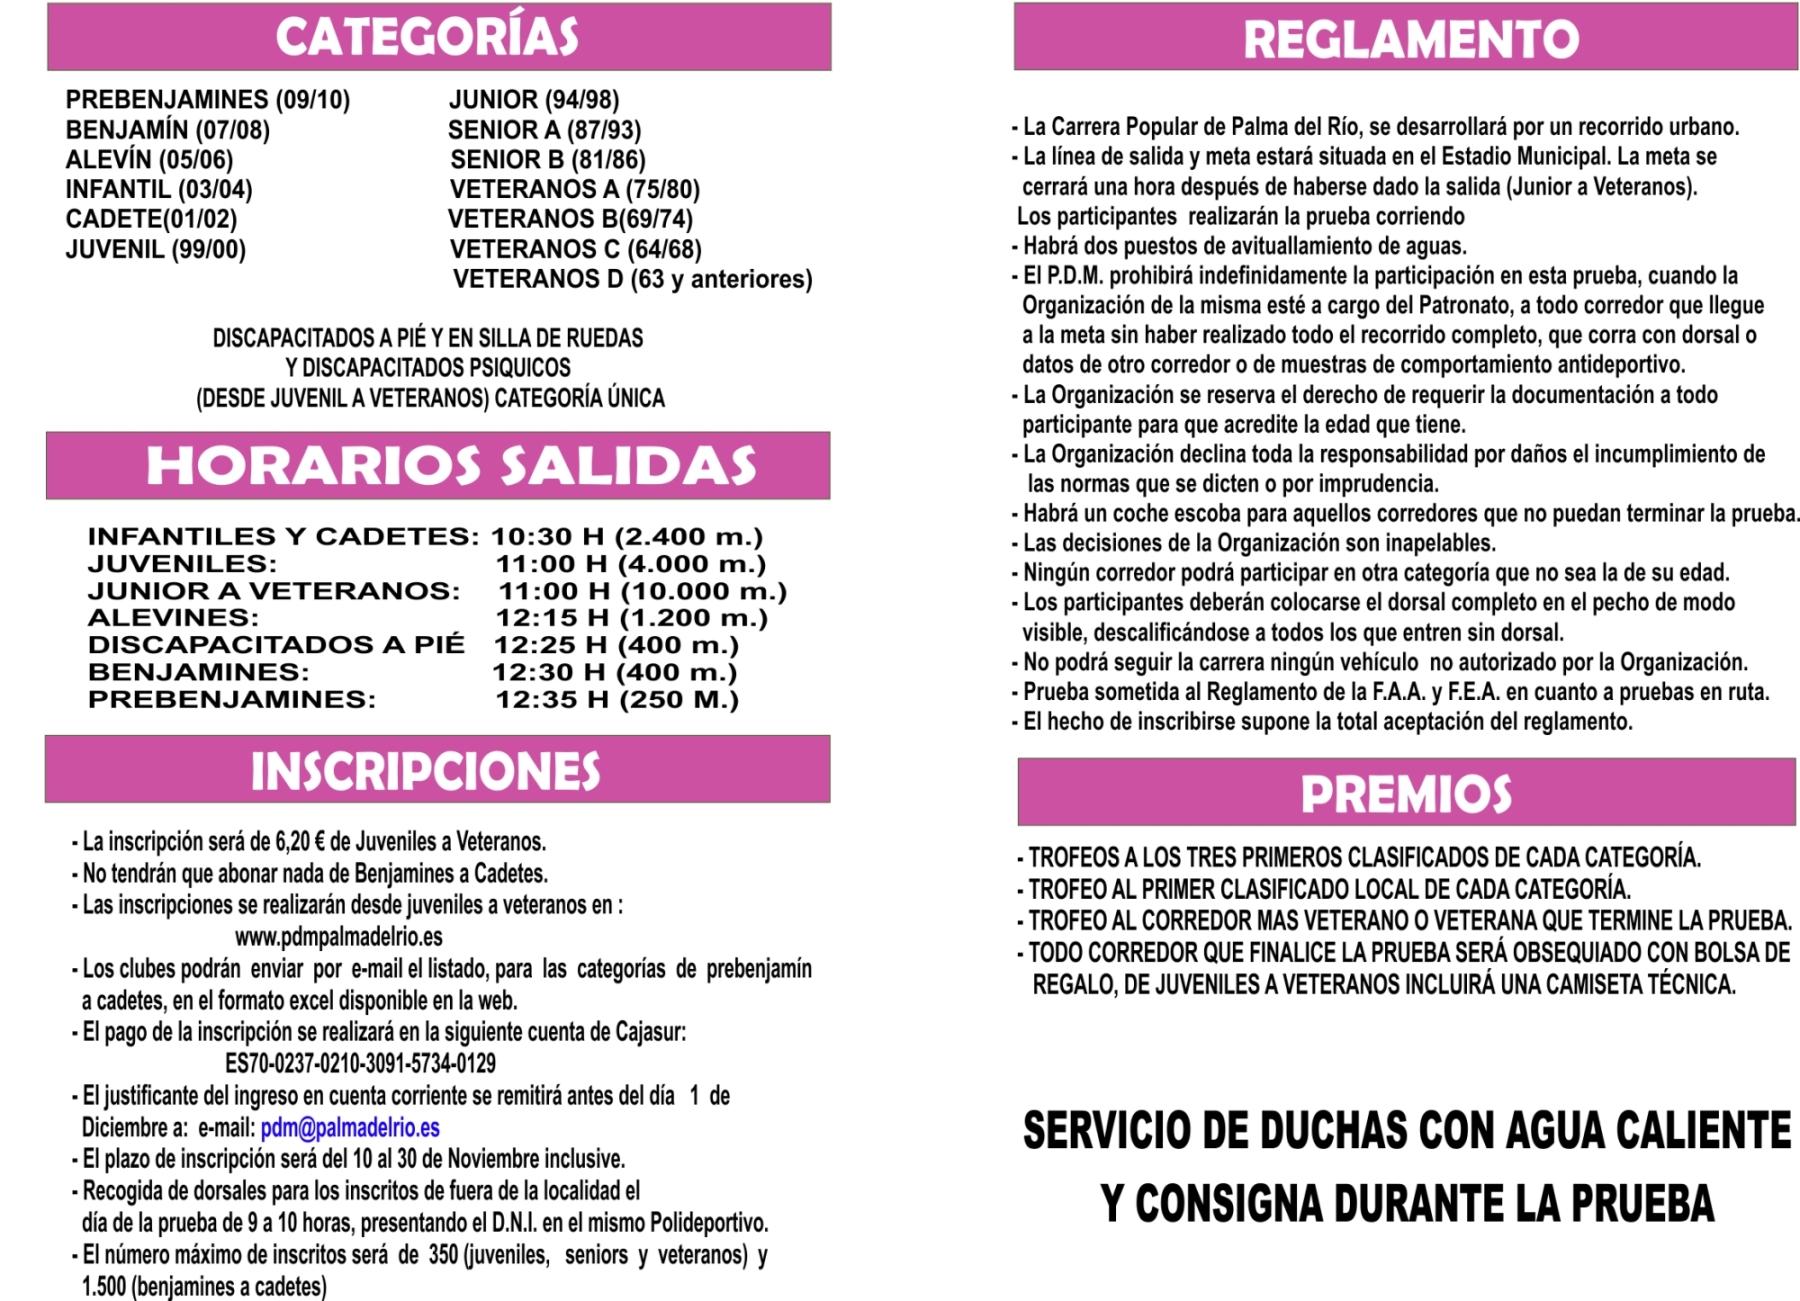 https://www.palmadelrio.es/sites/default/files/dipticocarrerapopularpalma2016reverso.jpg